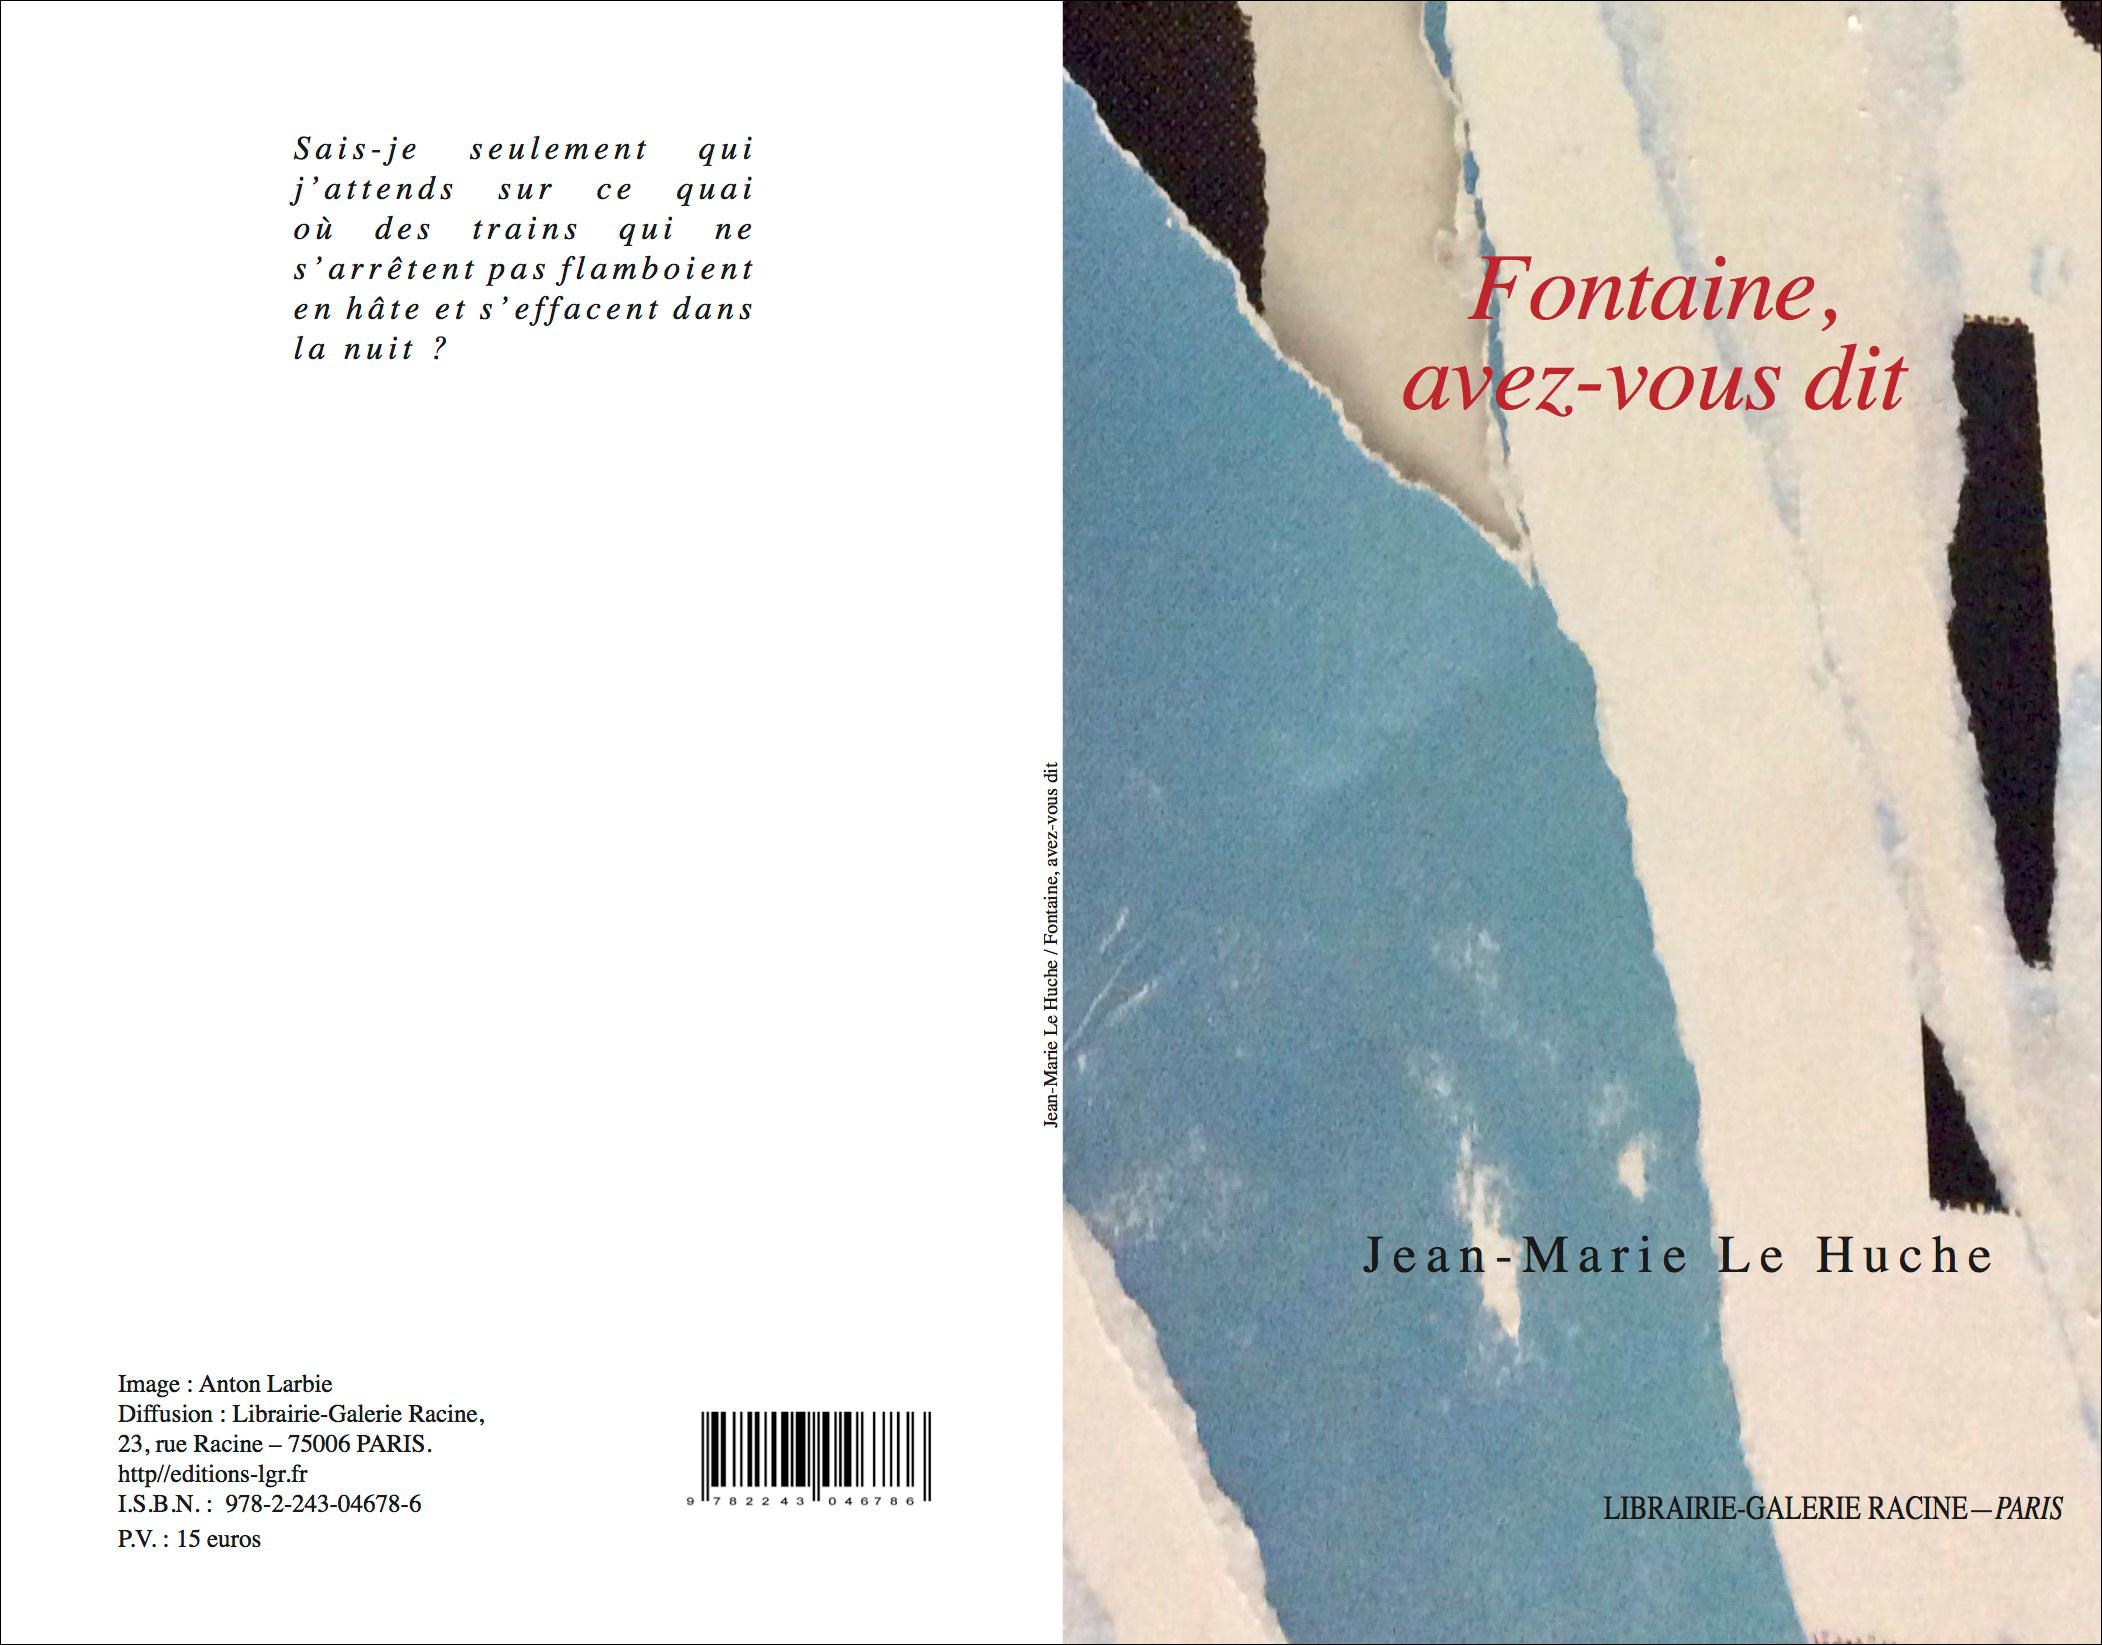 LE HUCHE Jean Marie - Fontaine